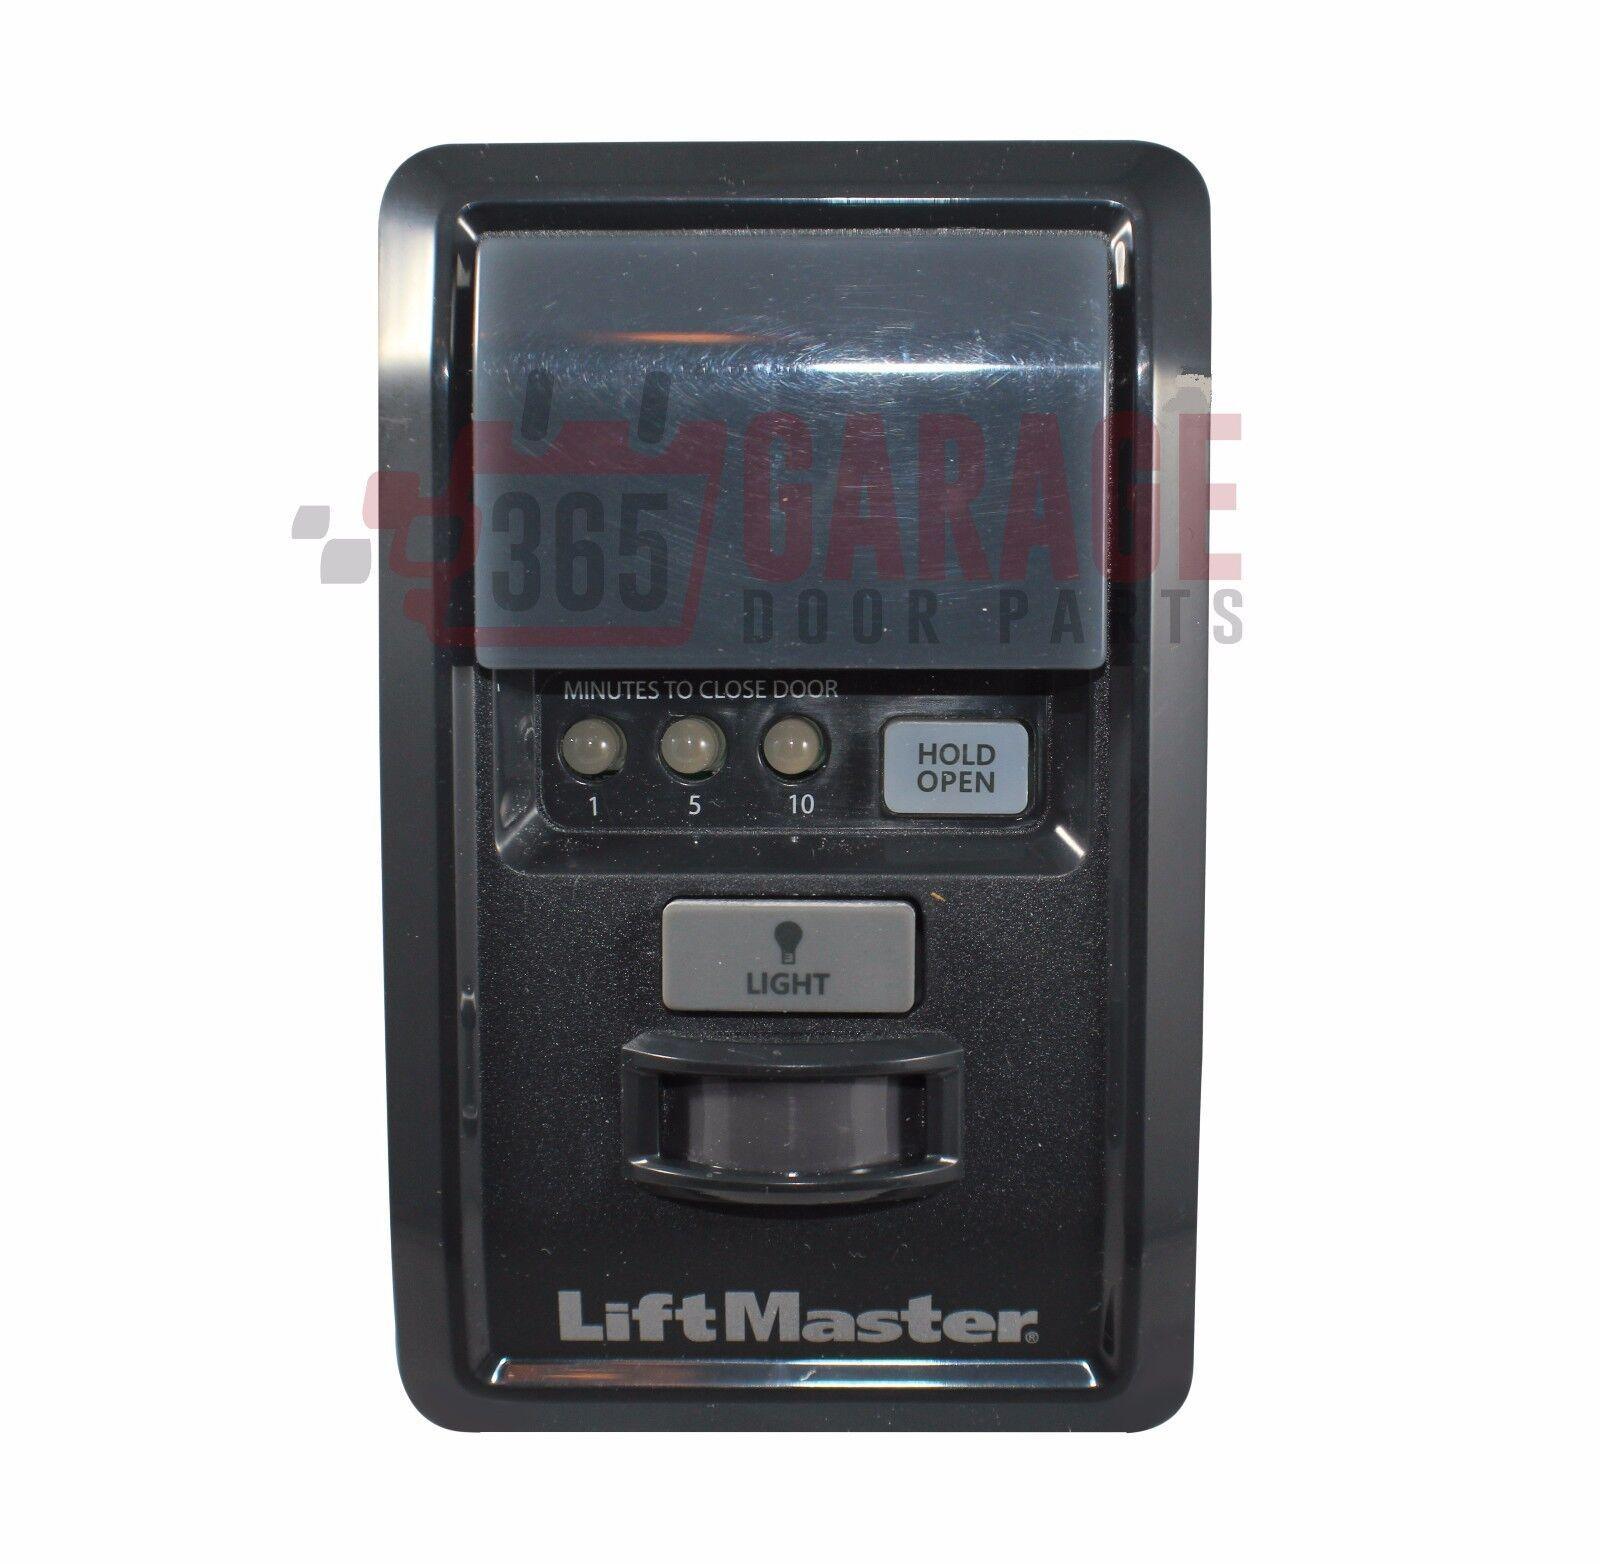 Liftmaster 881lmw Motion Detecting Control Panel W Ttc